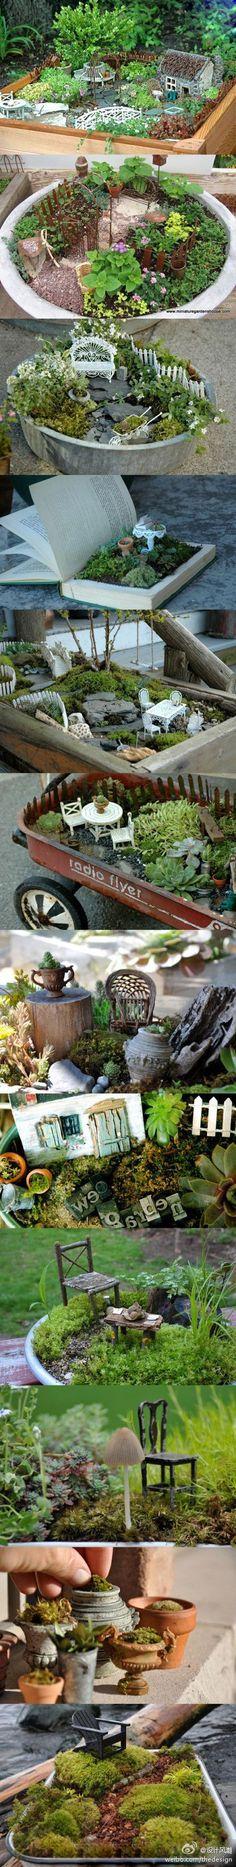 Miniature gardens love it